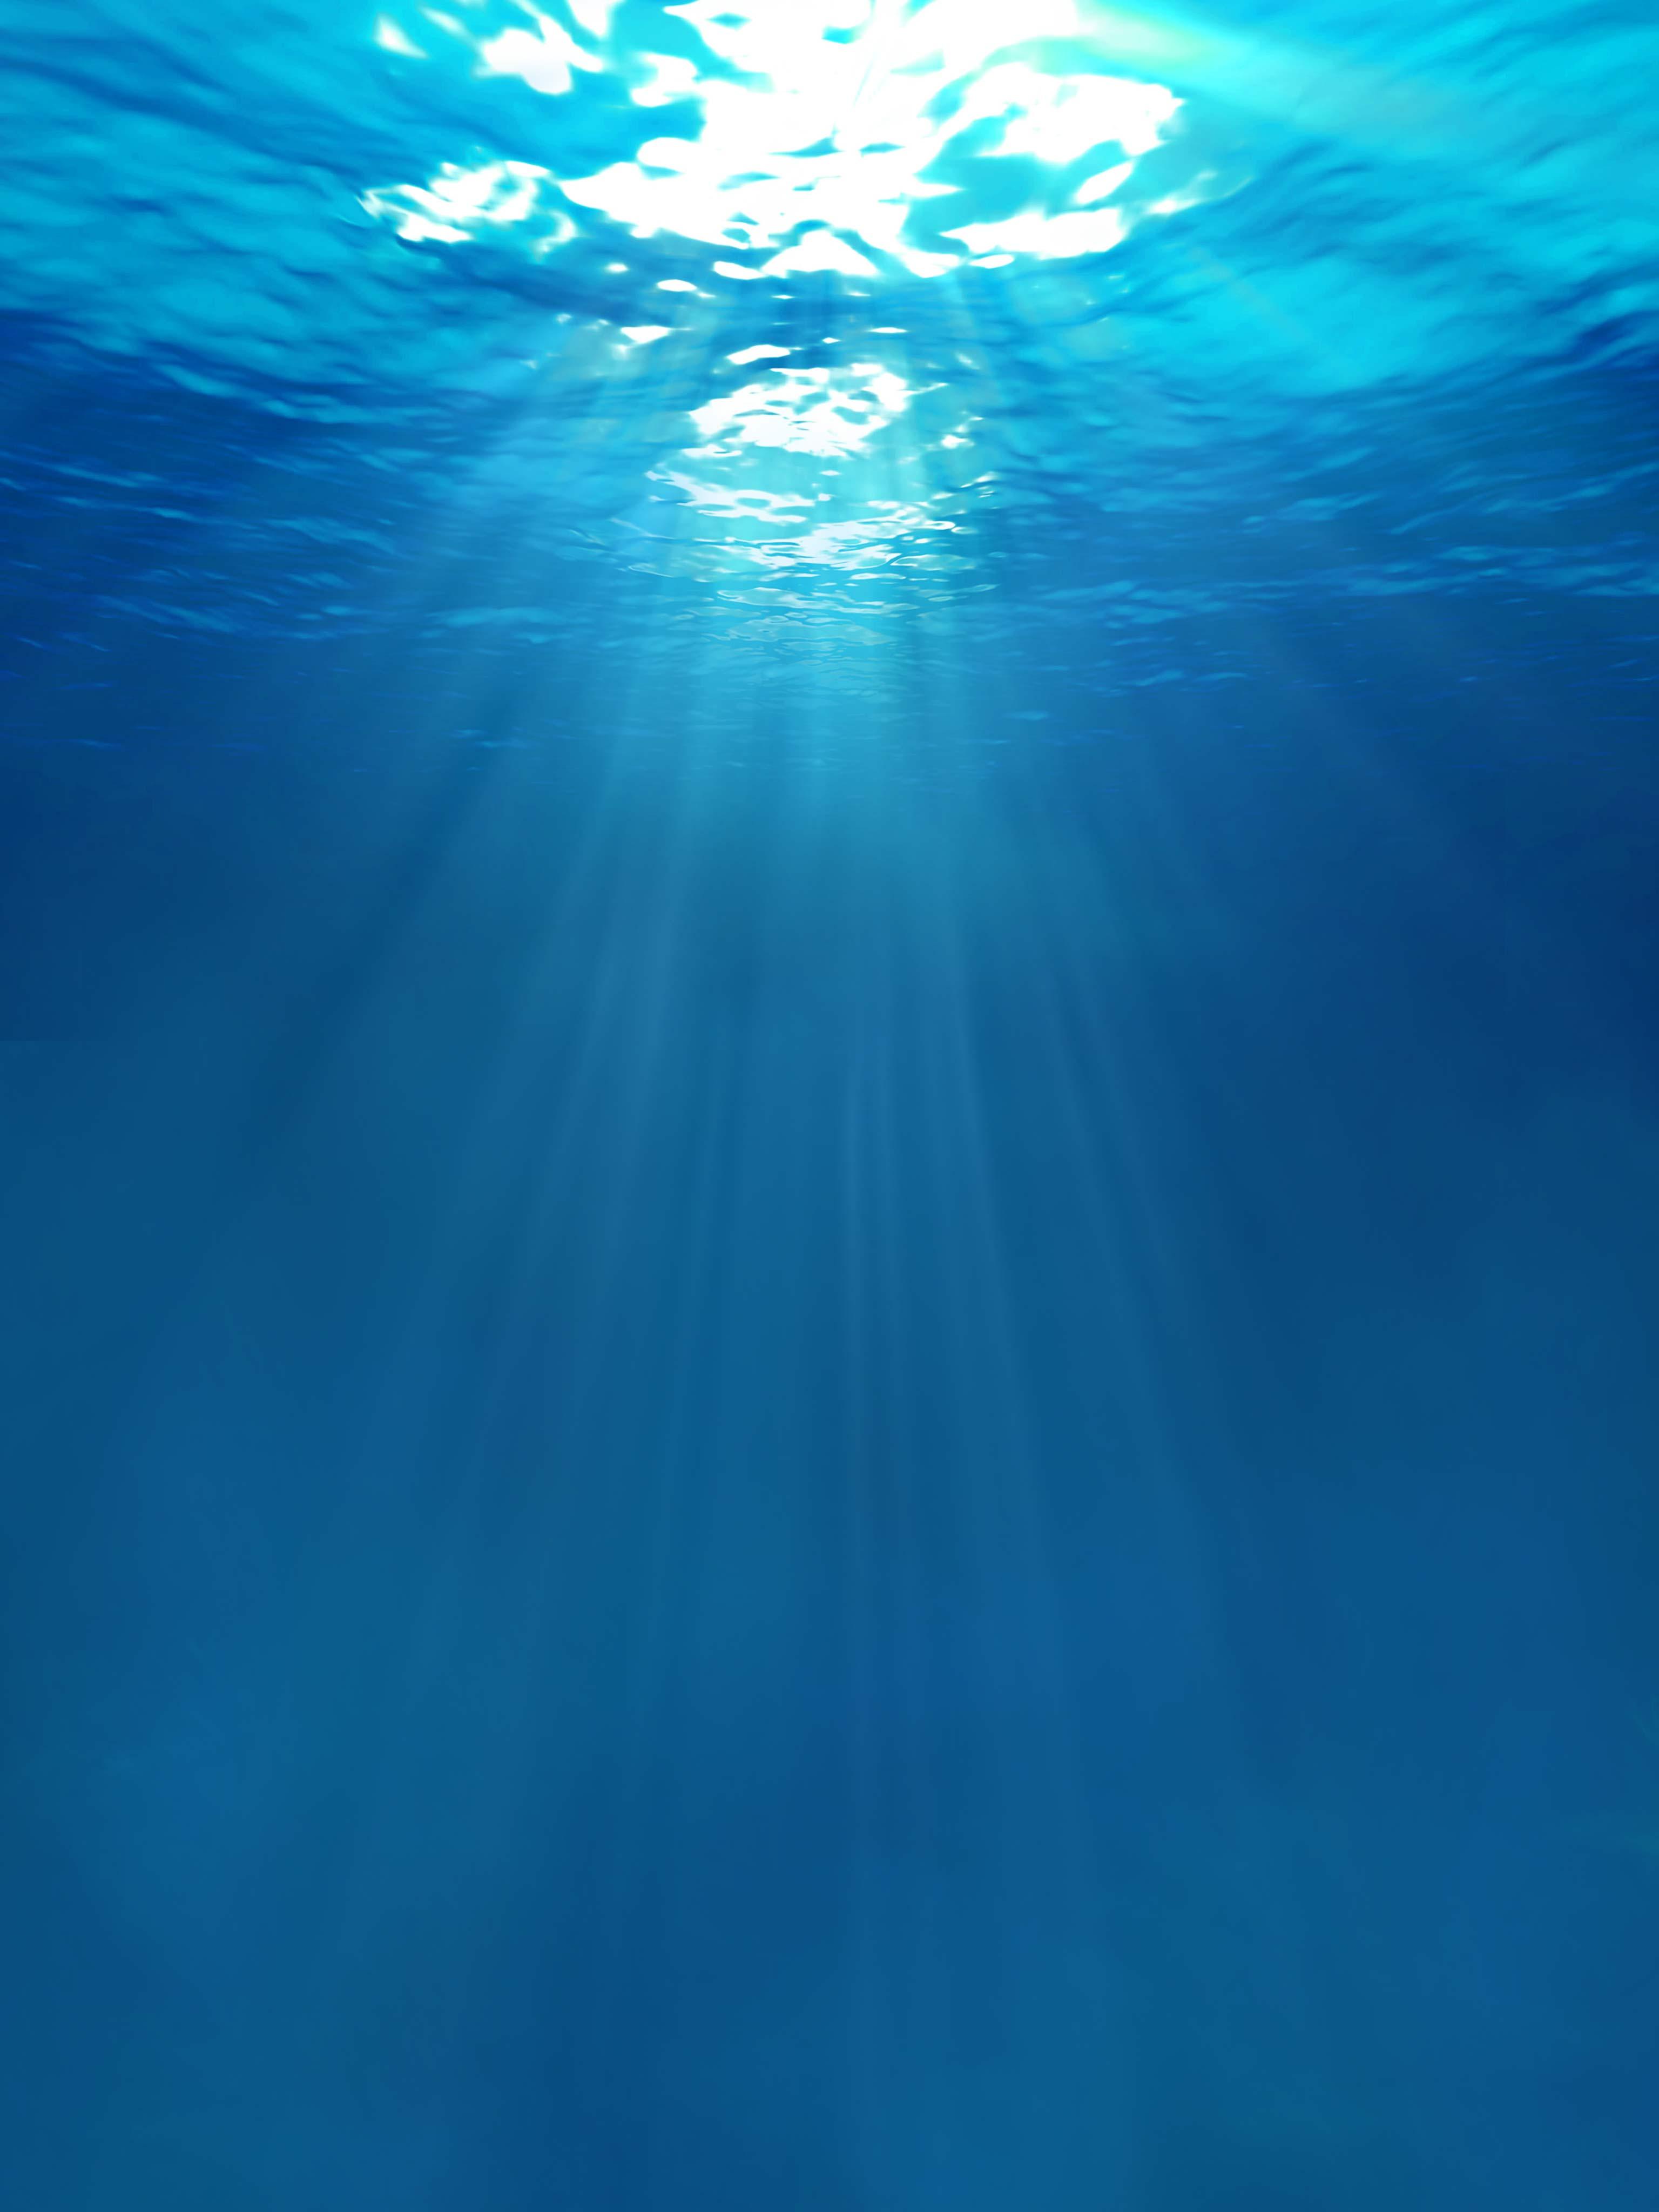 Underwater Sun Rays Mobile Wallpaper Miniwallist